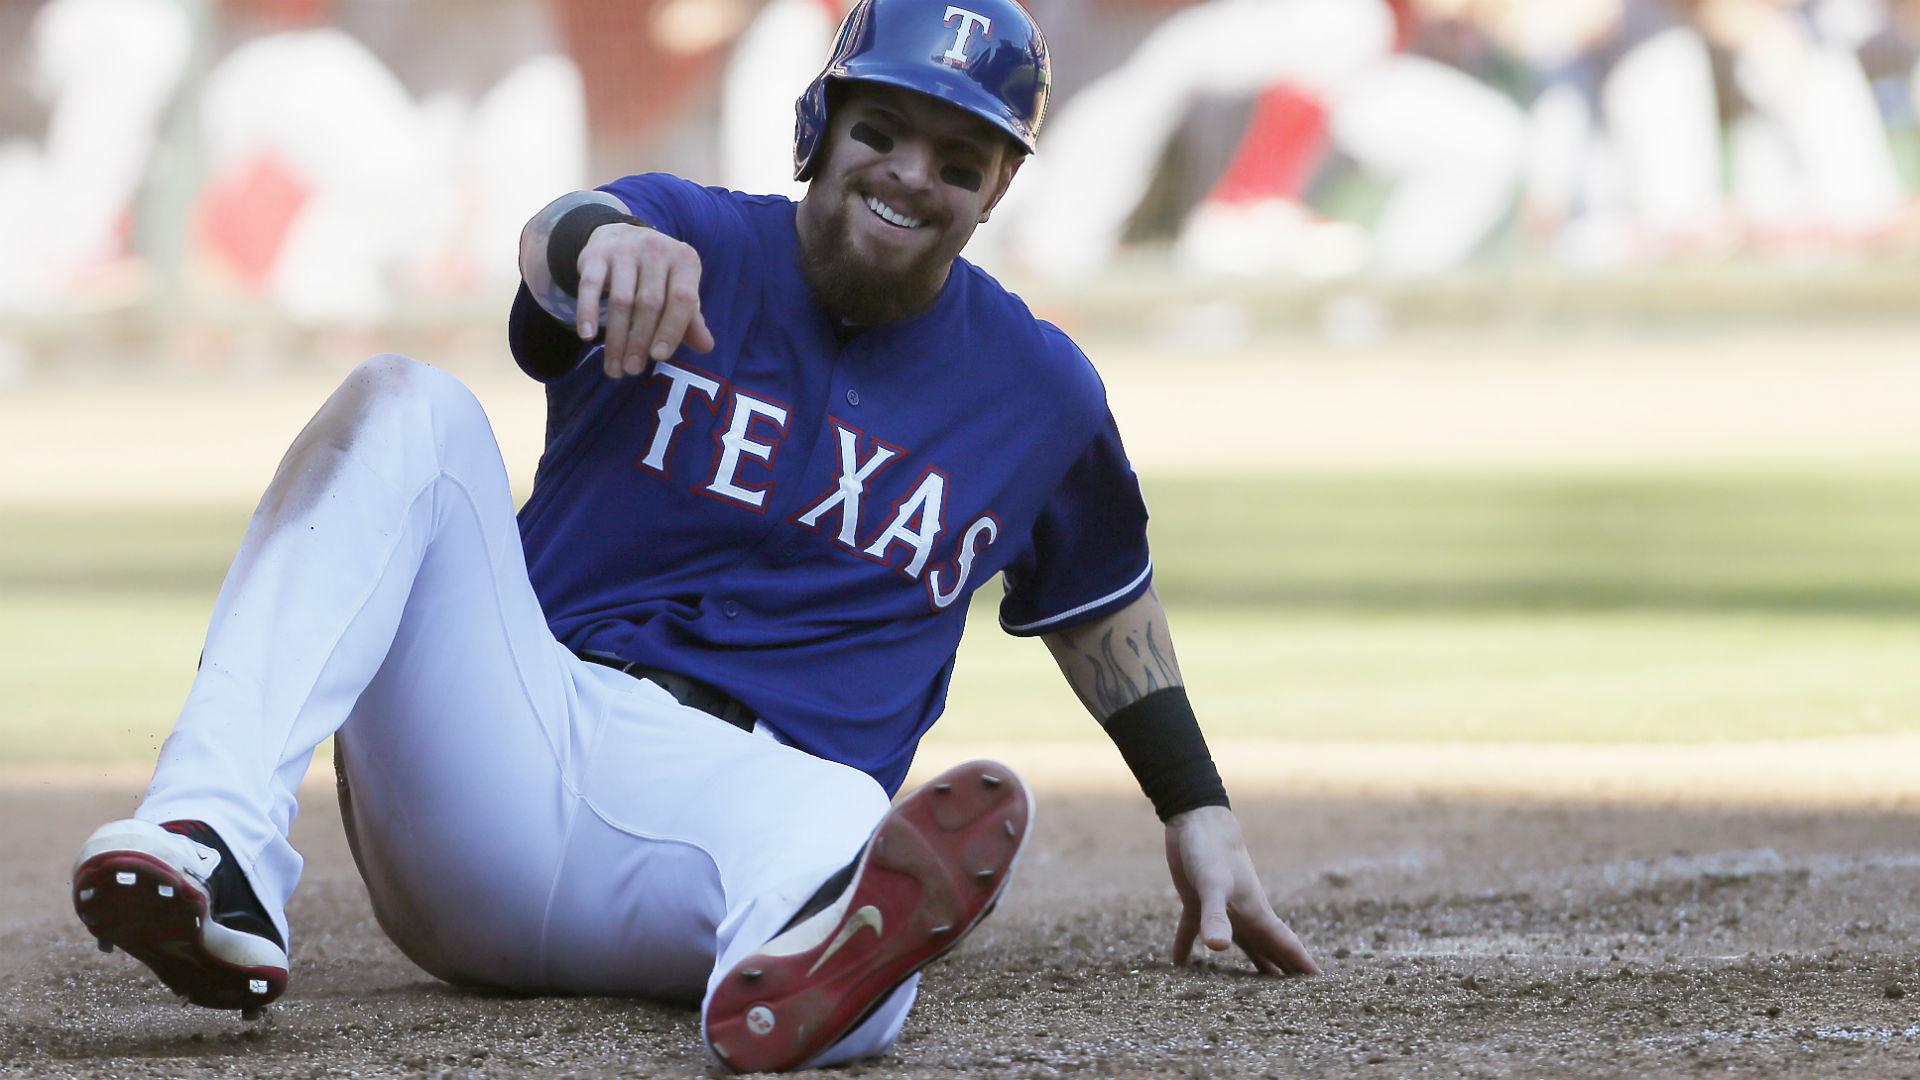 Josh Hamilton Will Miss All Season With Another Knee Surgery